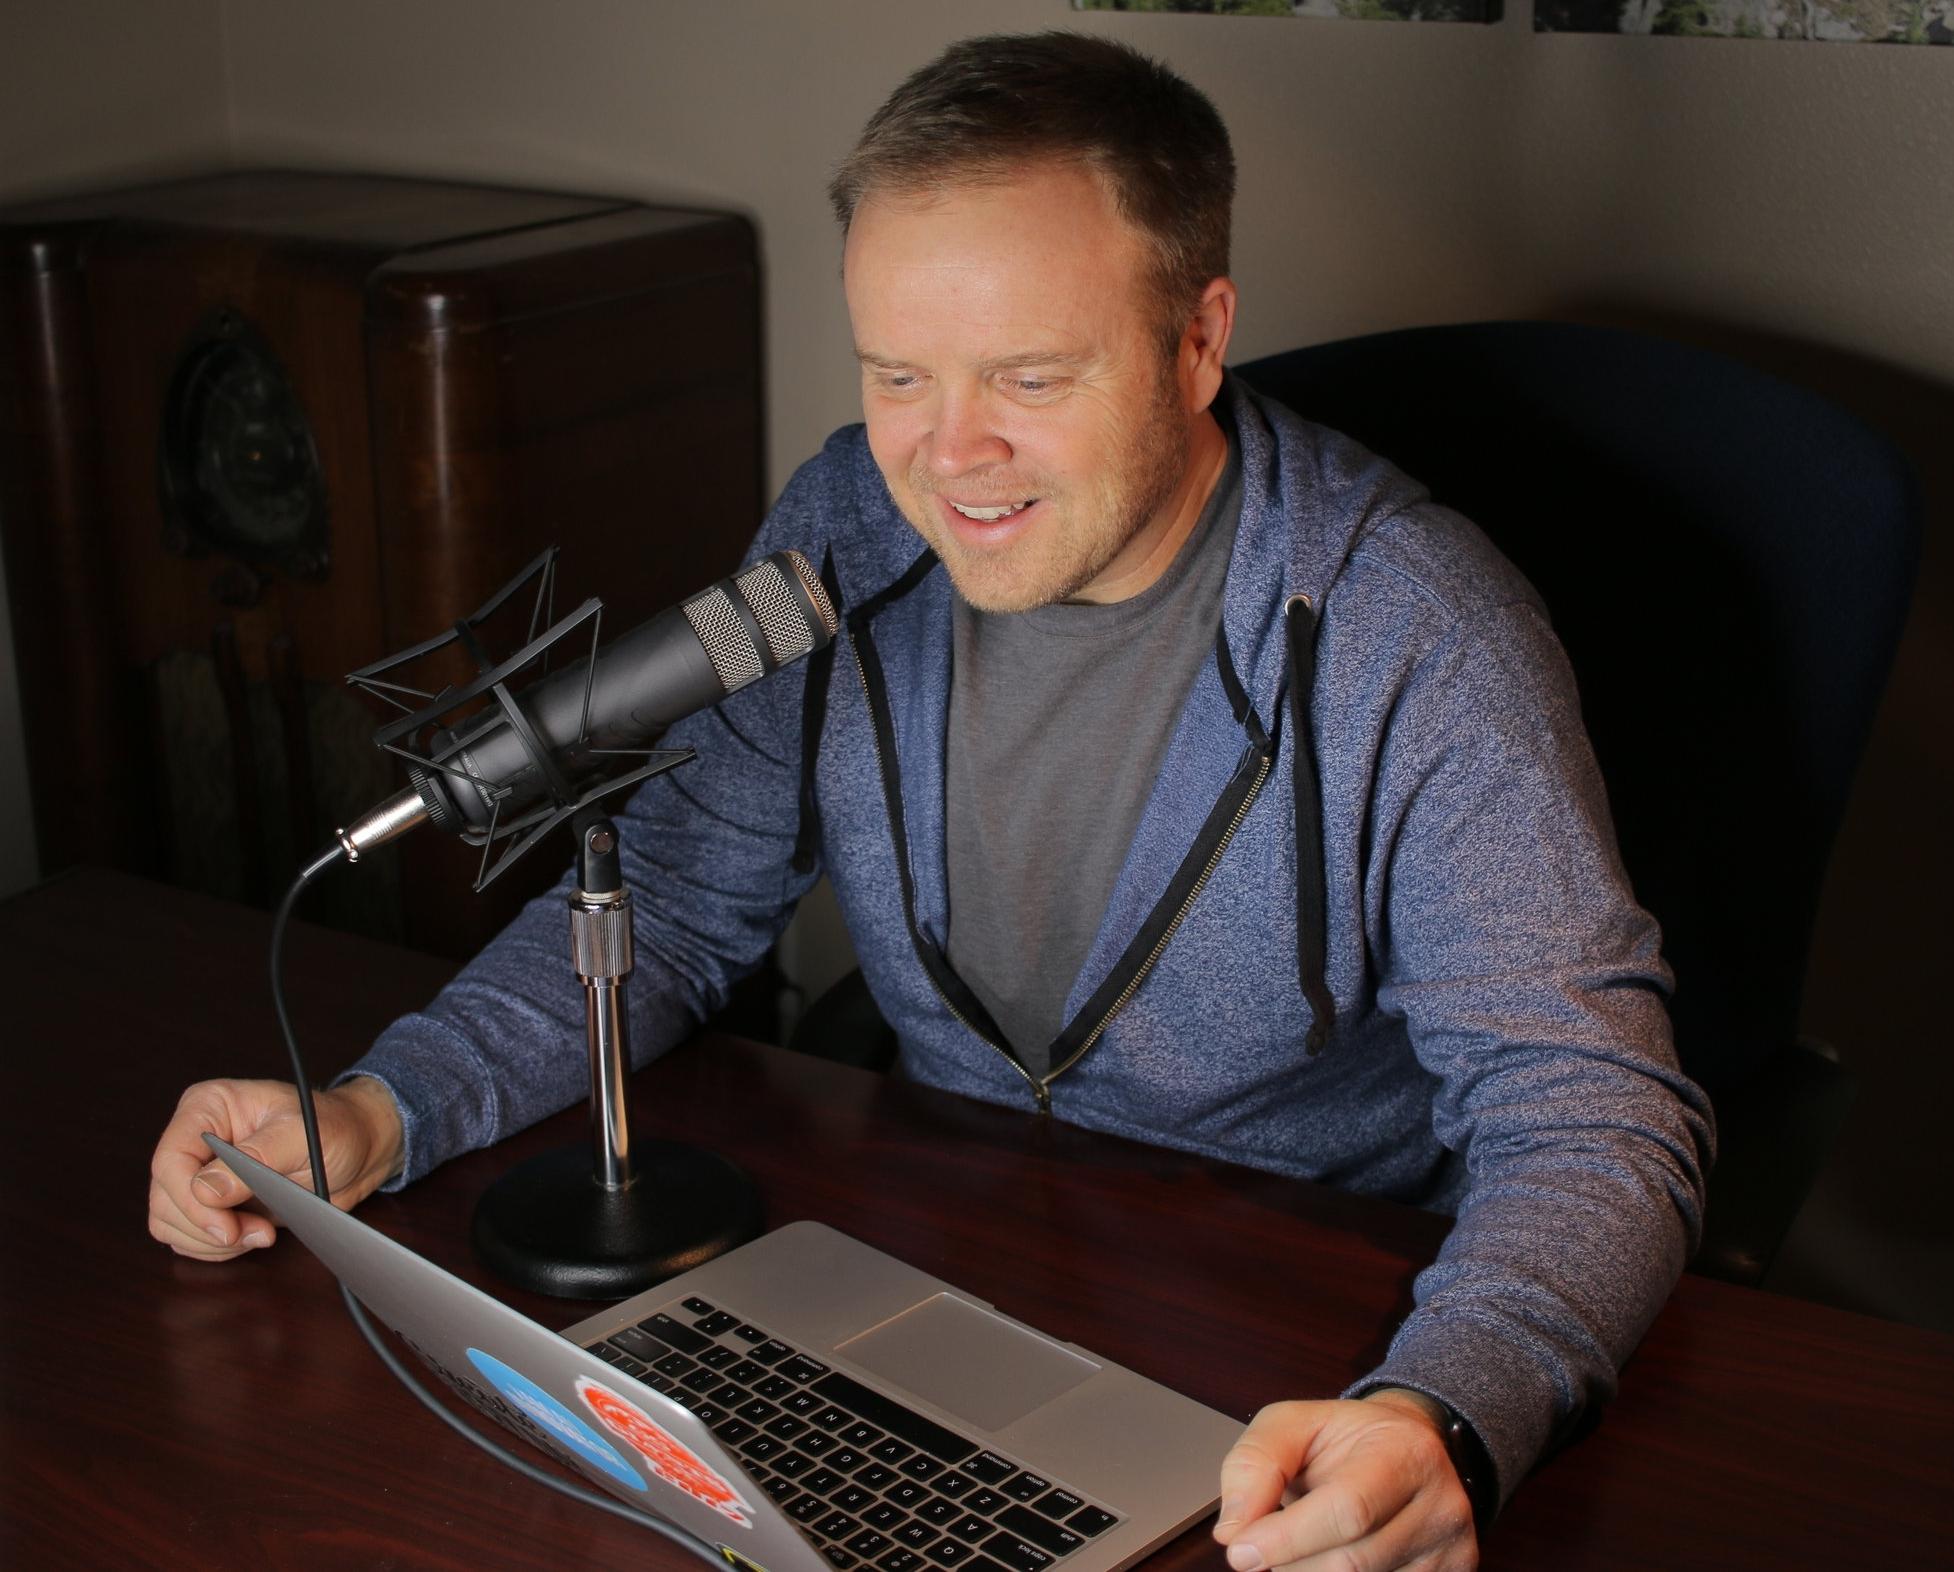 dale-dixon-hosts-podcast-with-jason-jennings.JPG